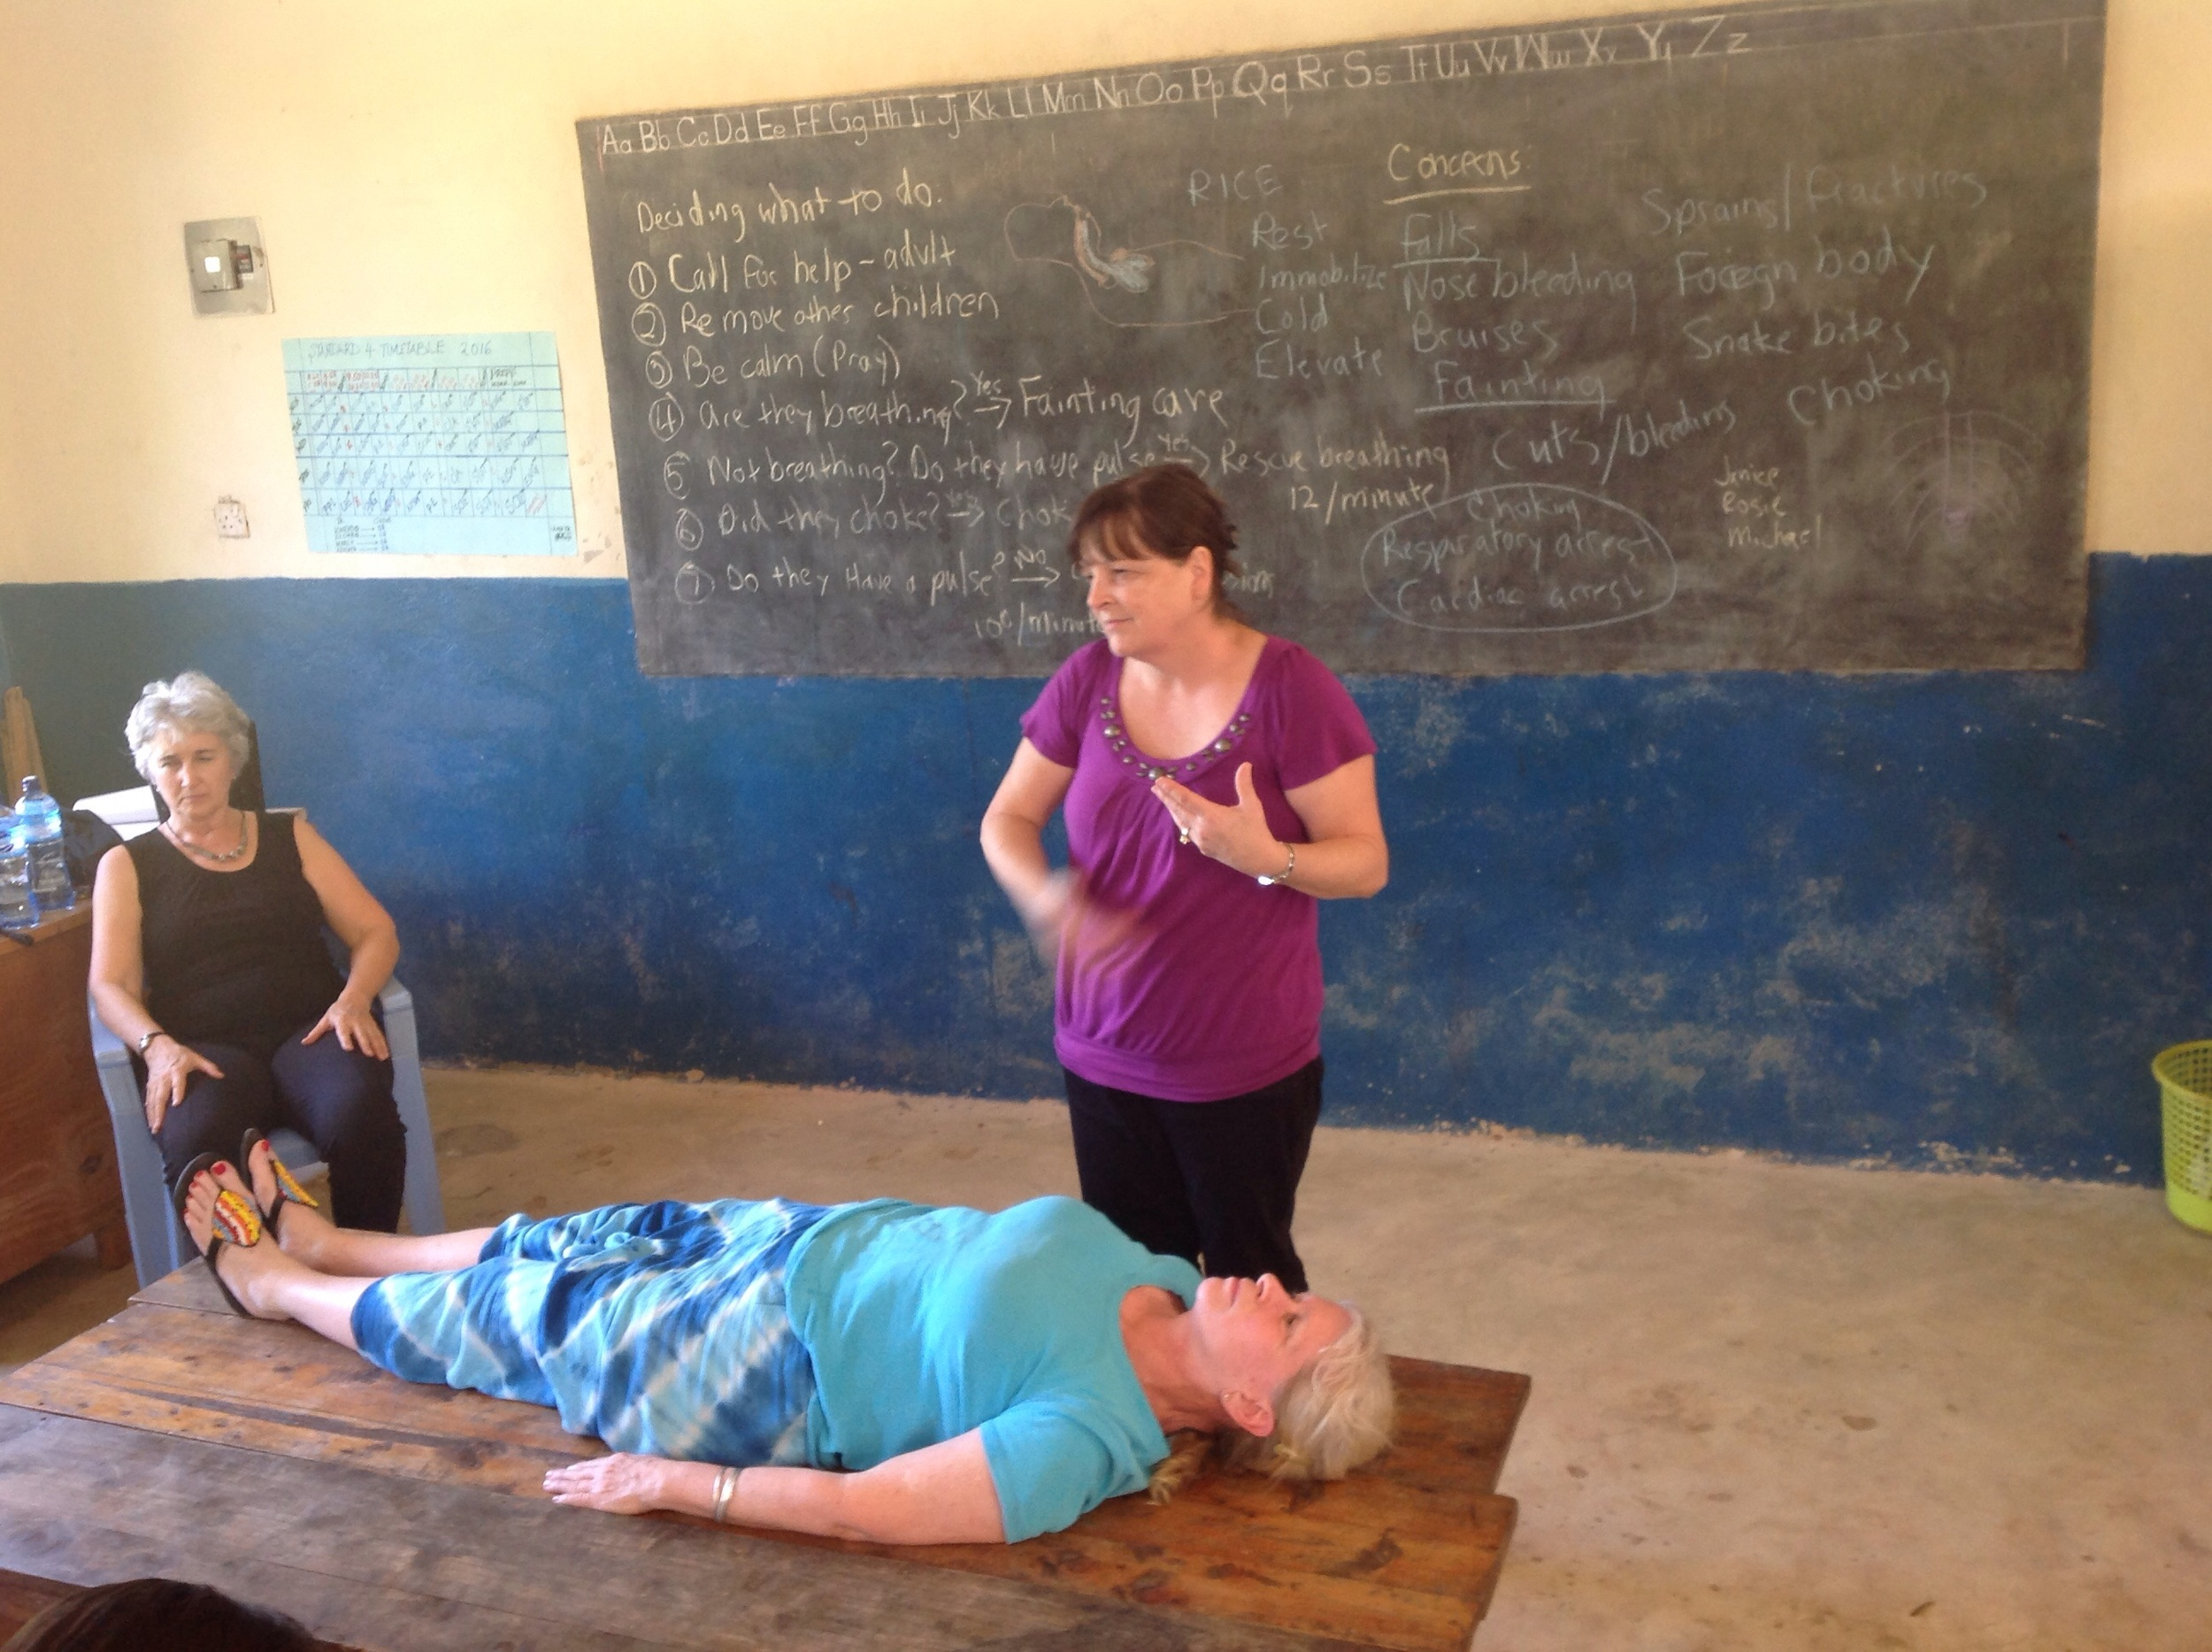 Jill, Cindy and Debbie - such great teachers!